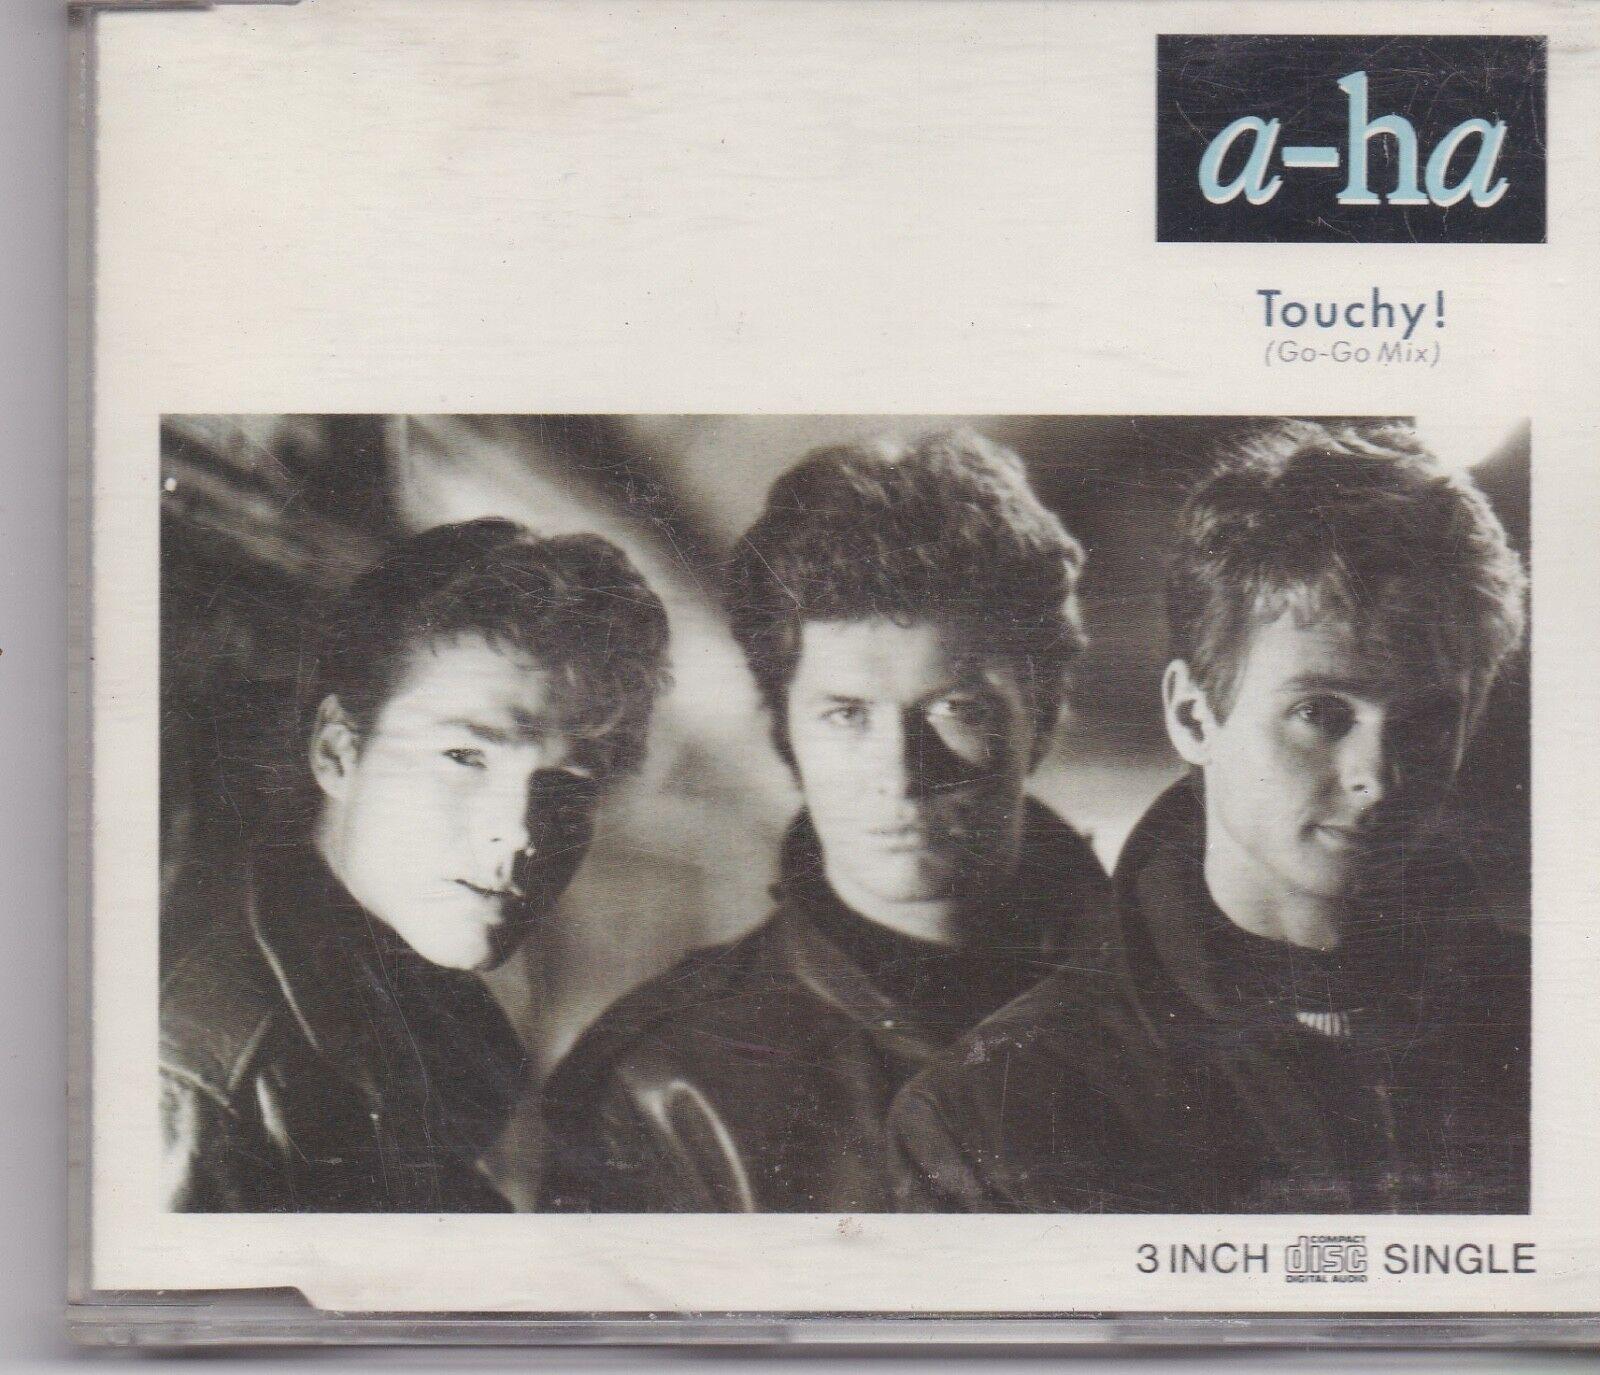 A-Ha-Touchy 3 inch cd maxi single